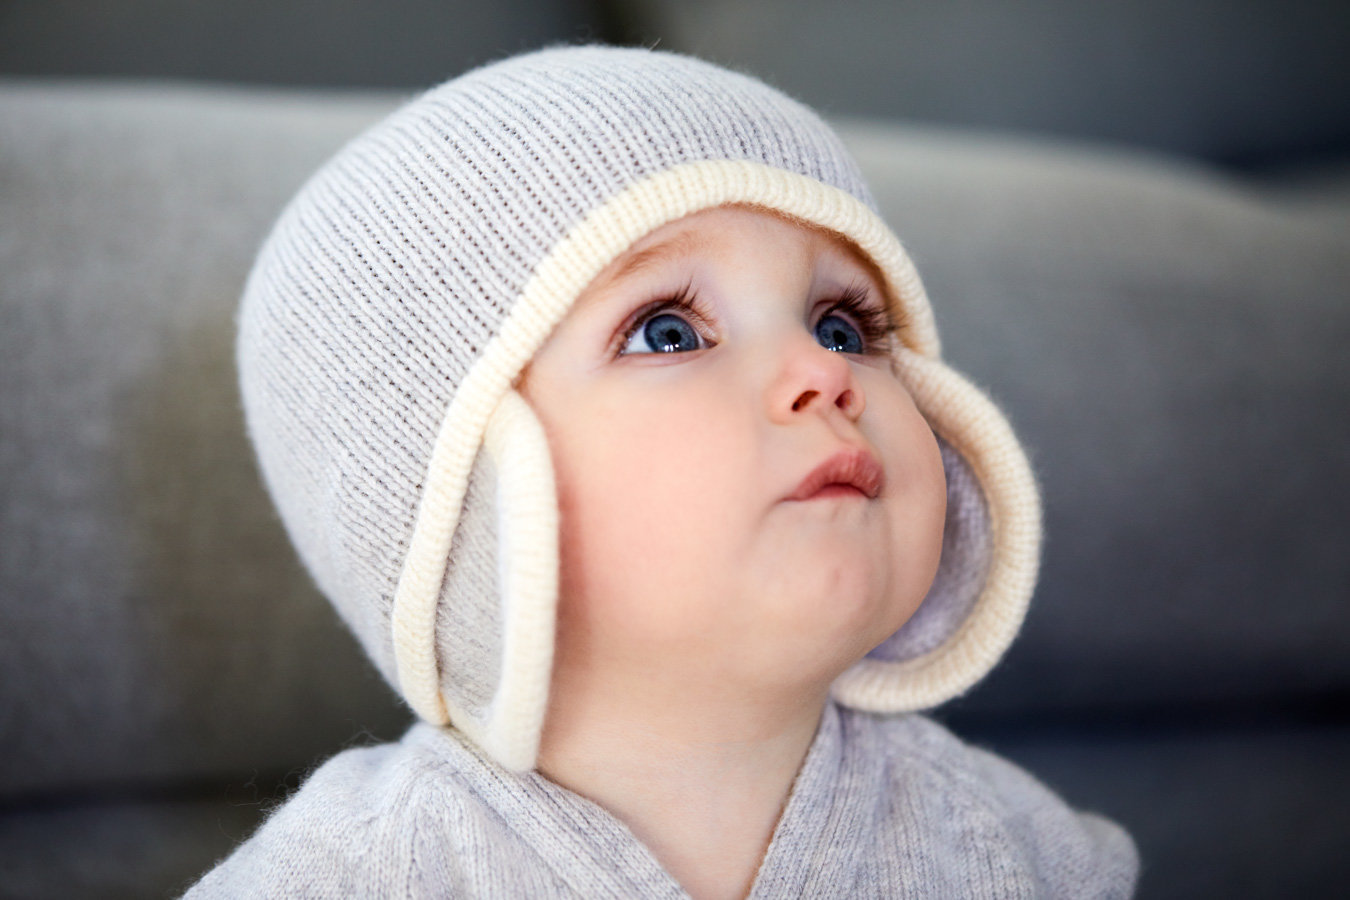 BABYbaby_1602181866.jpg